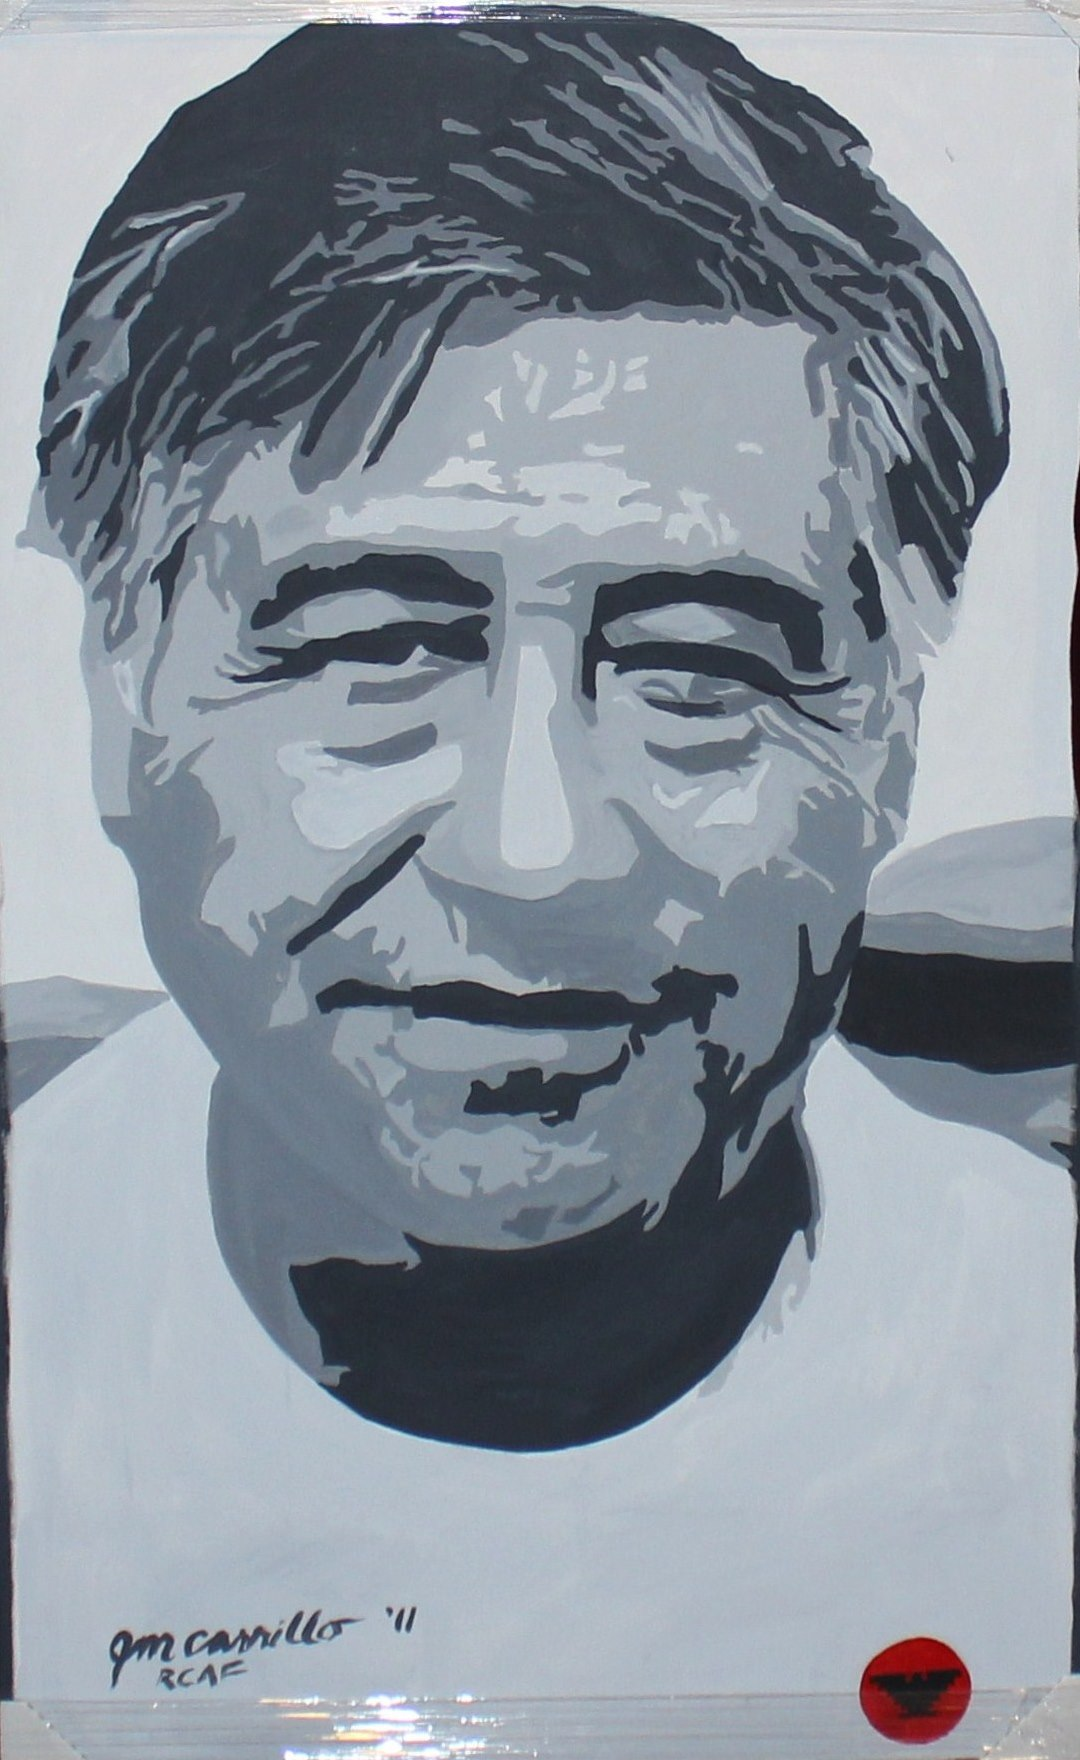 Honoring César E. Chávez